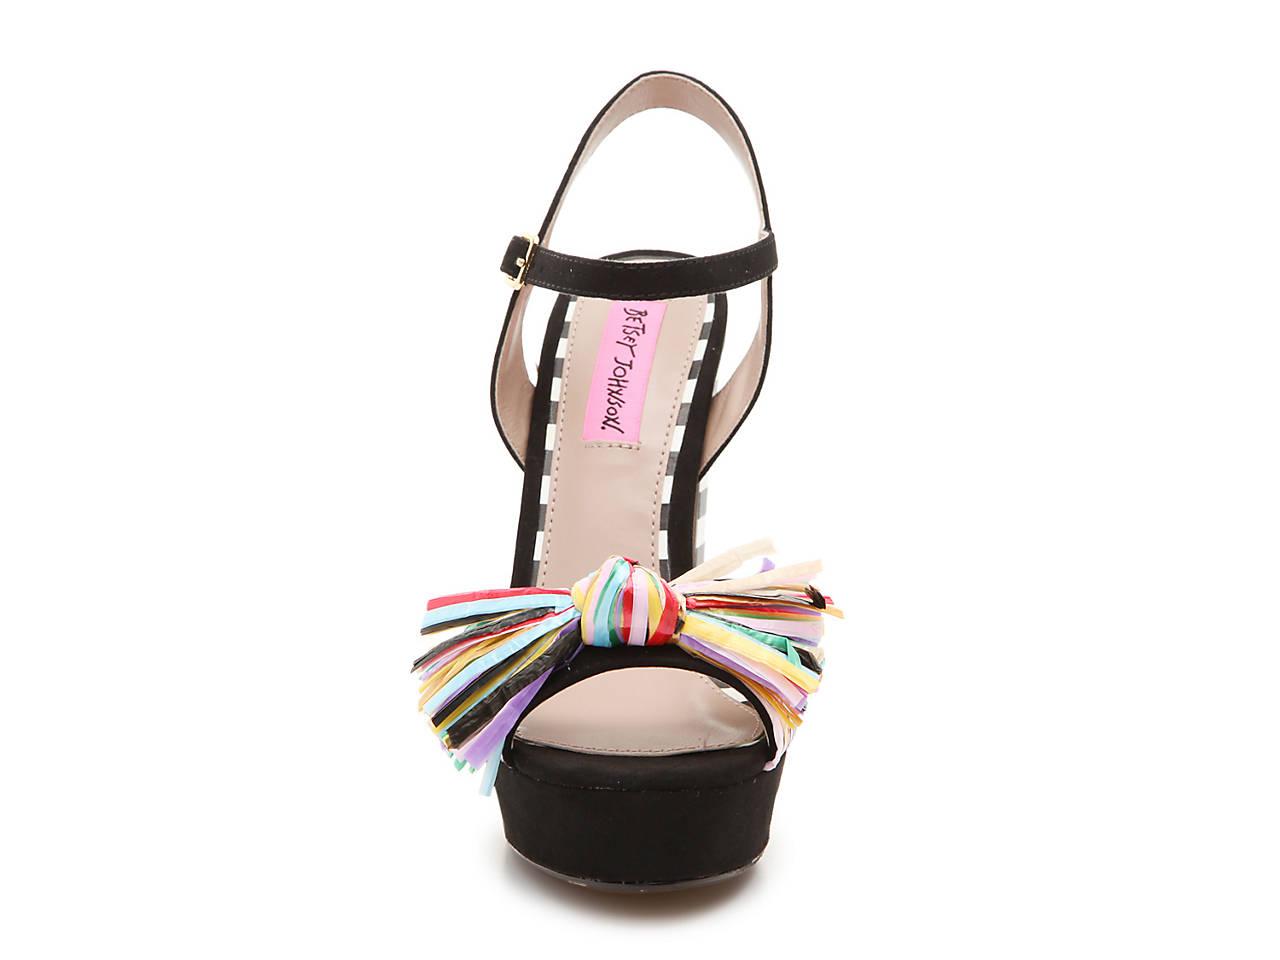 882eaecf20 Betsey Johnson Mandy Platform Sandal Women's Shoes | DSW